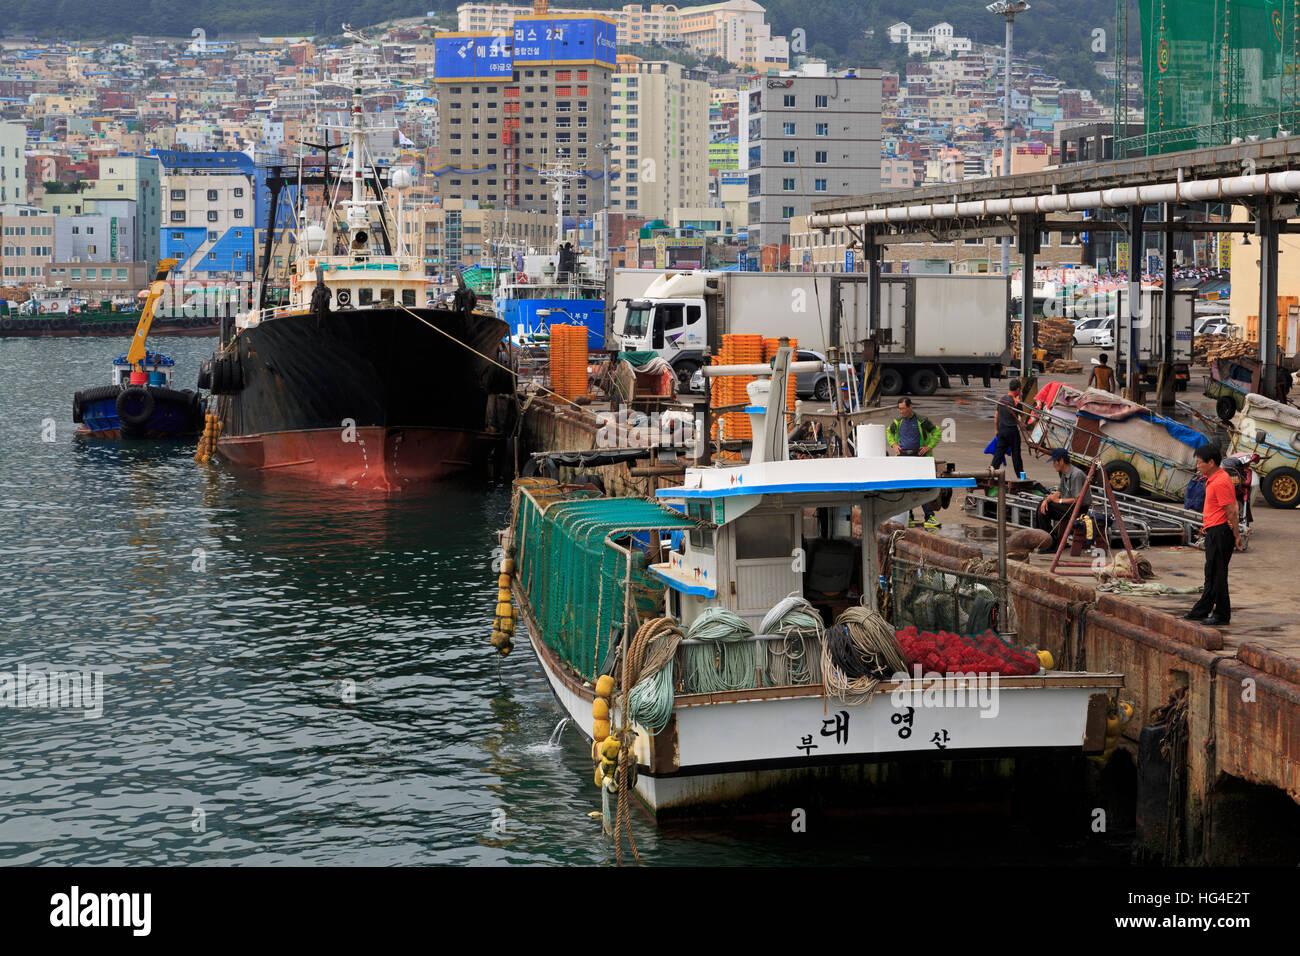 Fish Market, Nampo District, Busan, South Korea, Asia - Stock Image